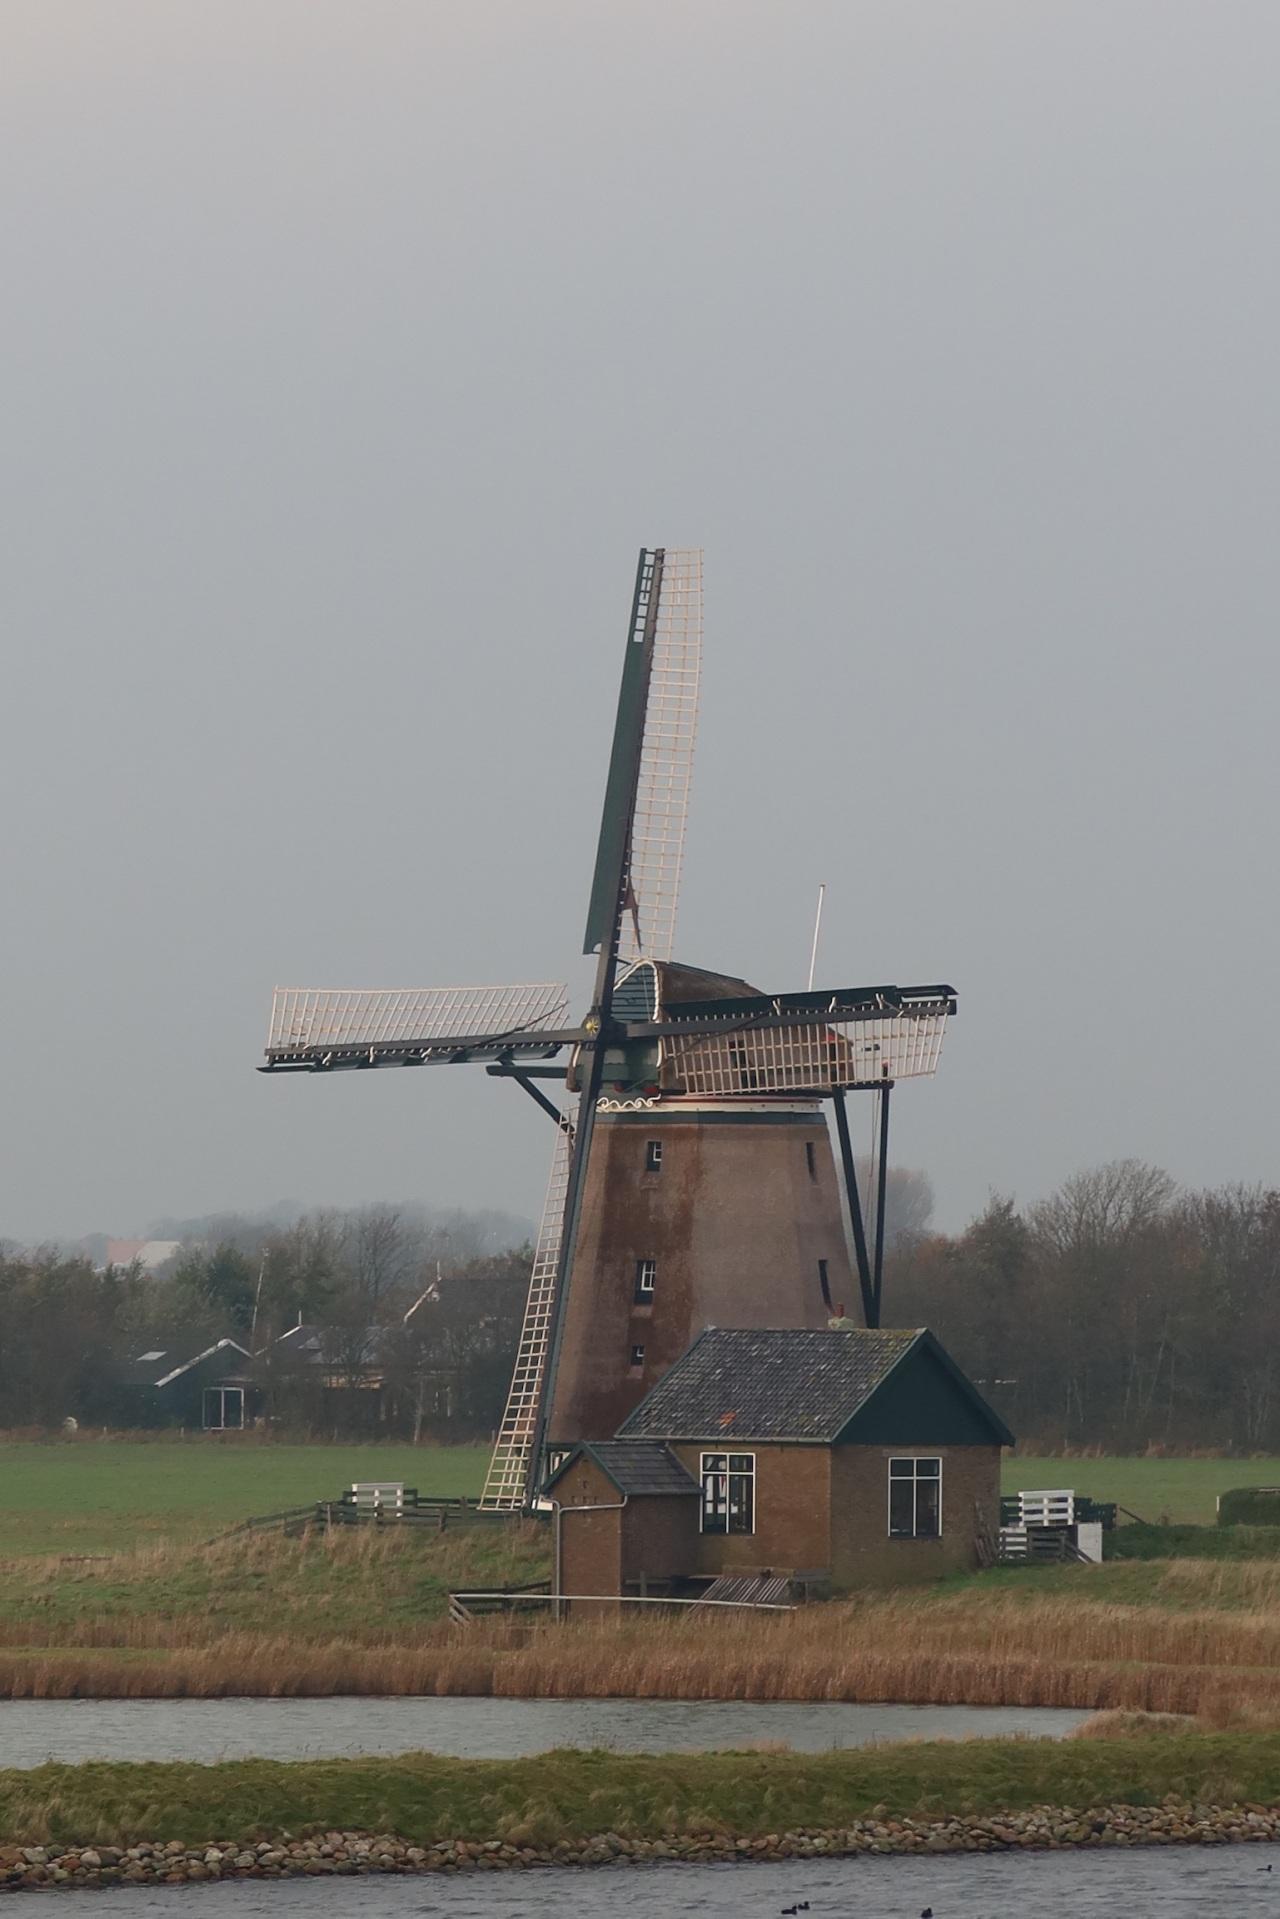 Saturday on Texel